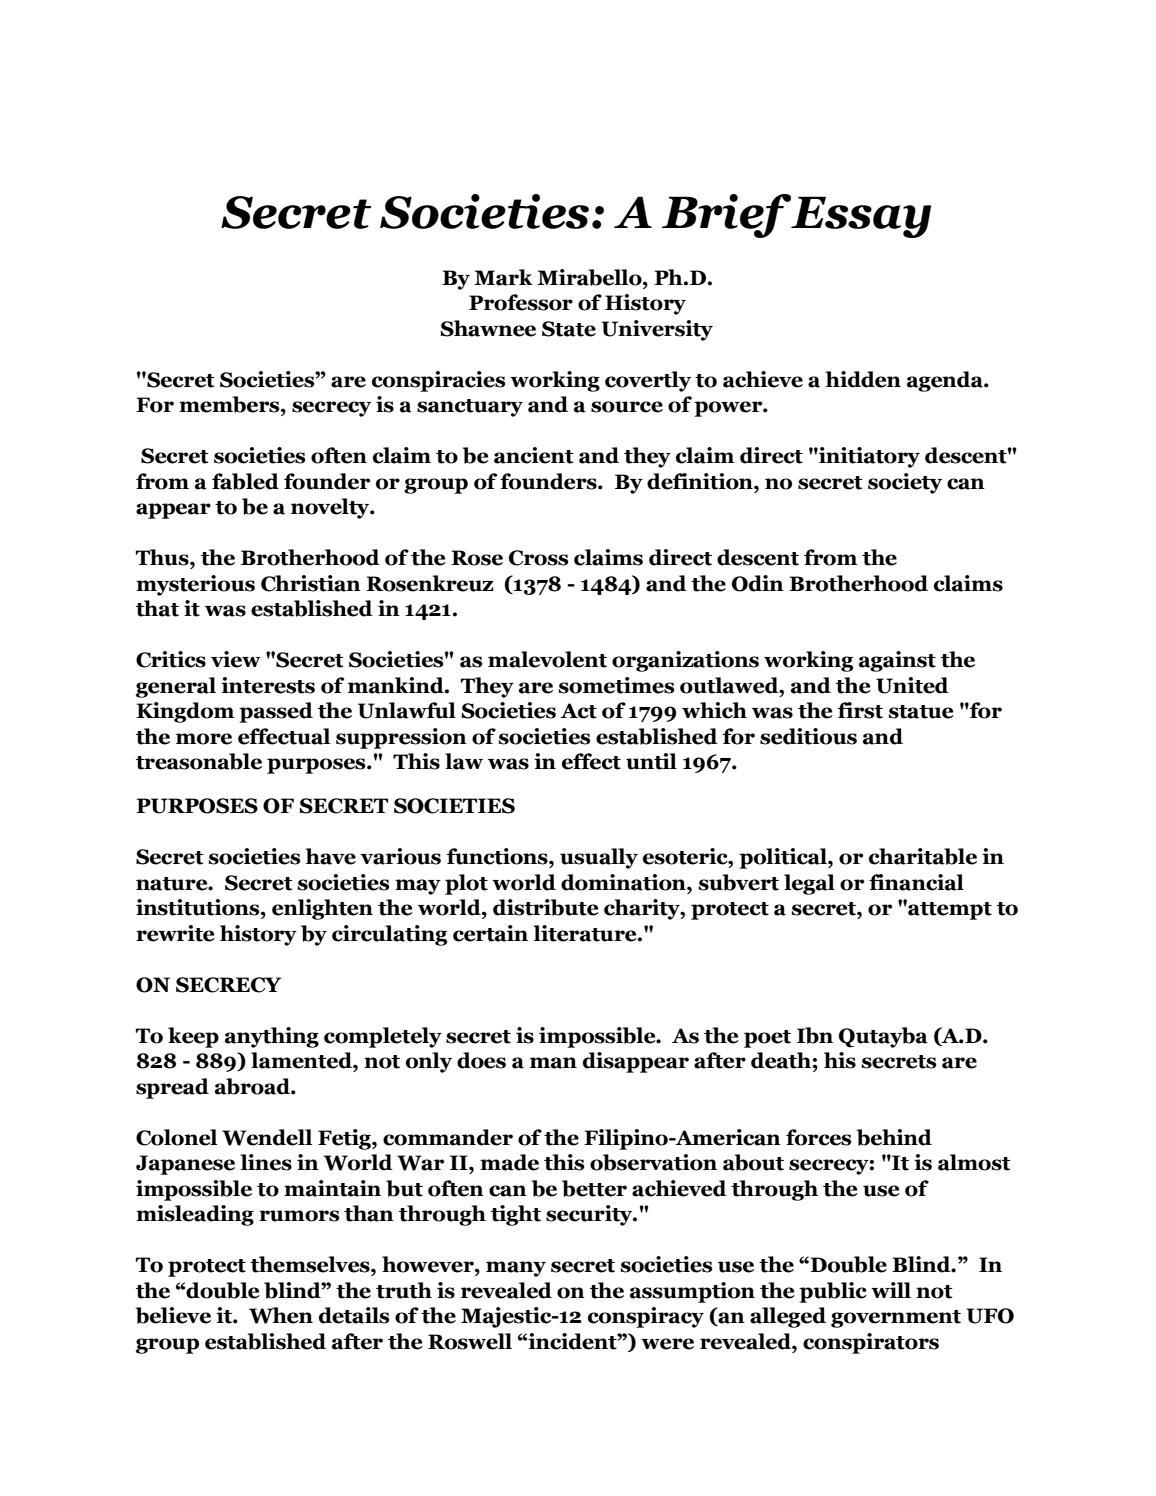 Secrecy essay